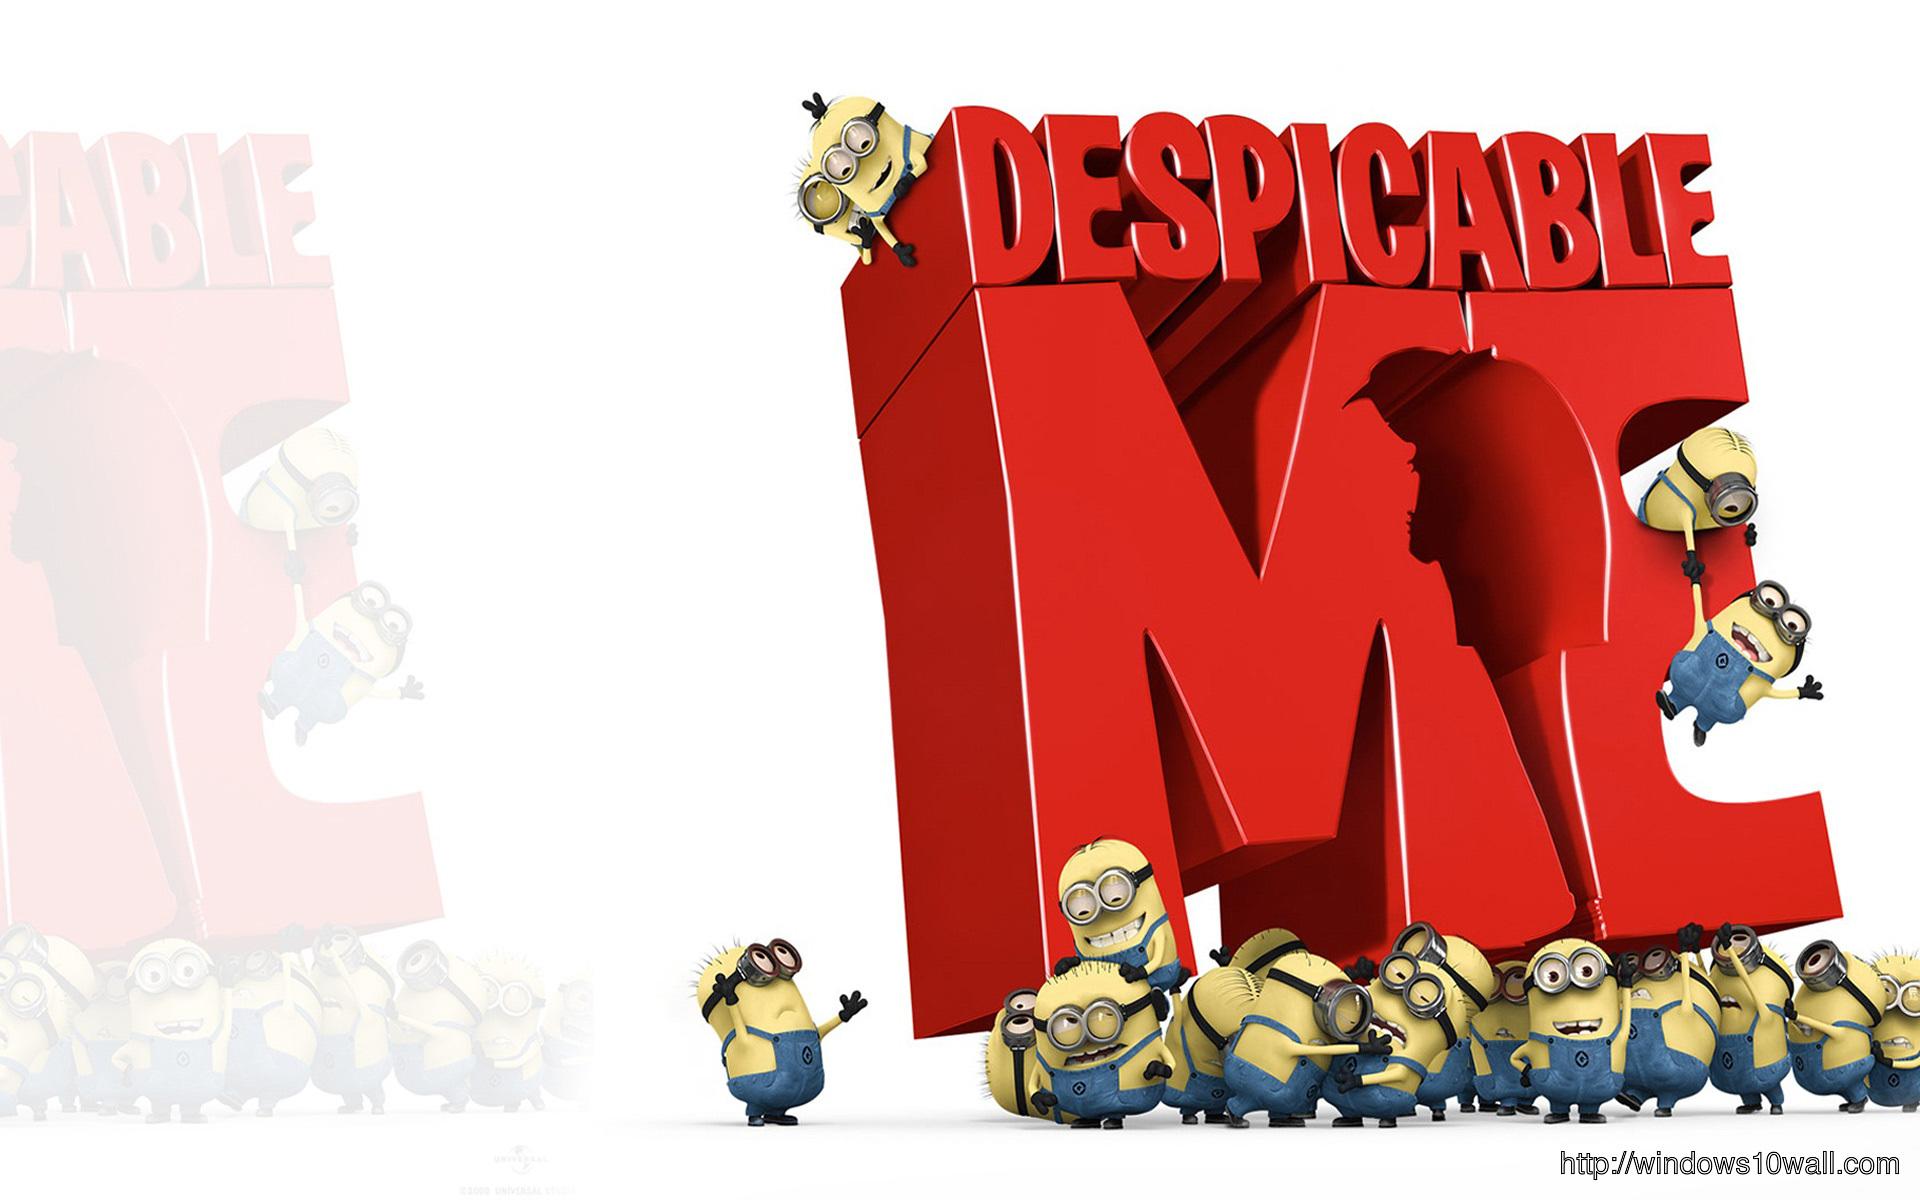 Cartoons Wallpapers - Despicable Me - Minions wallpaper